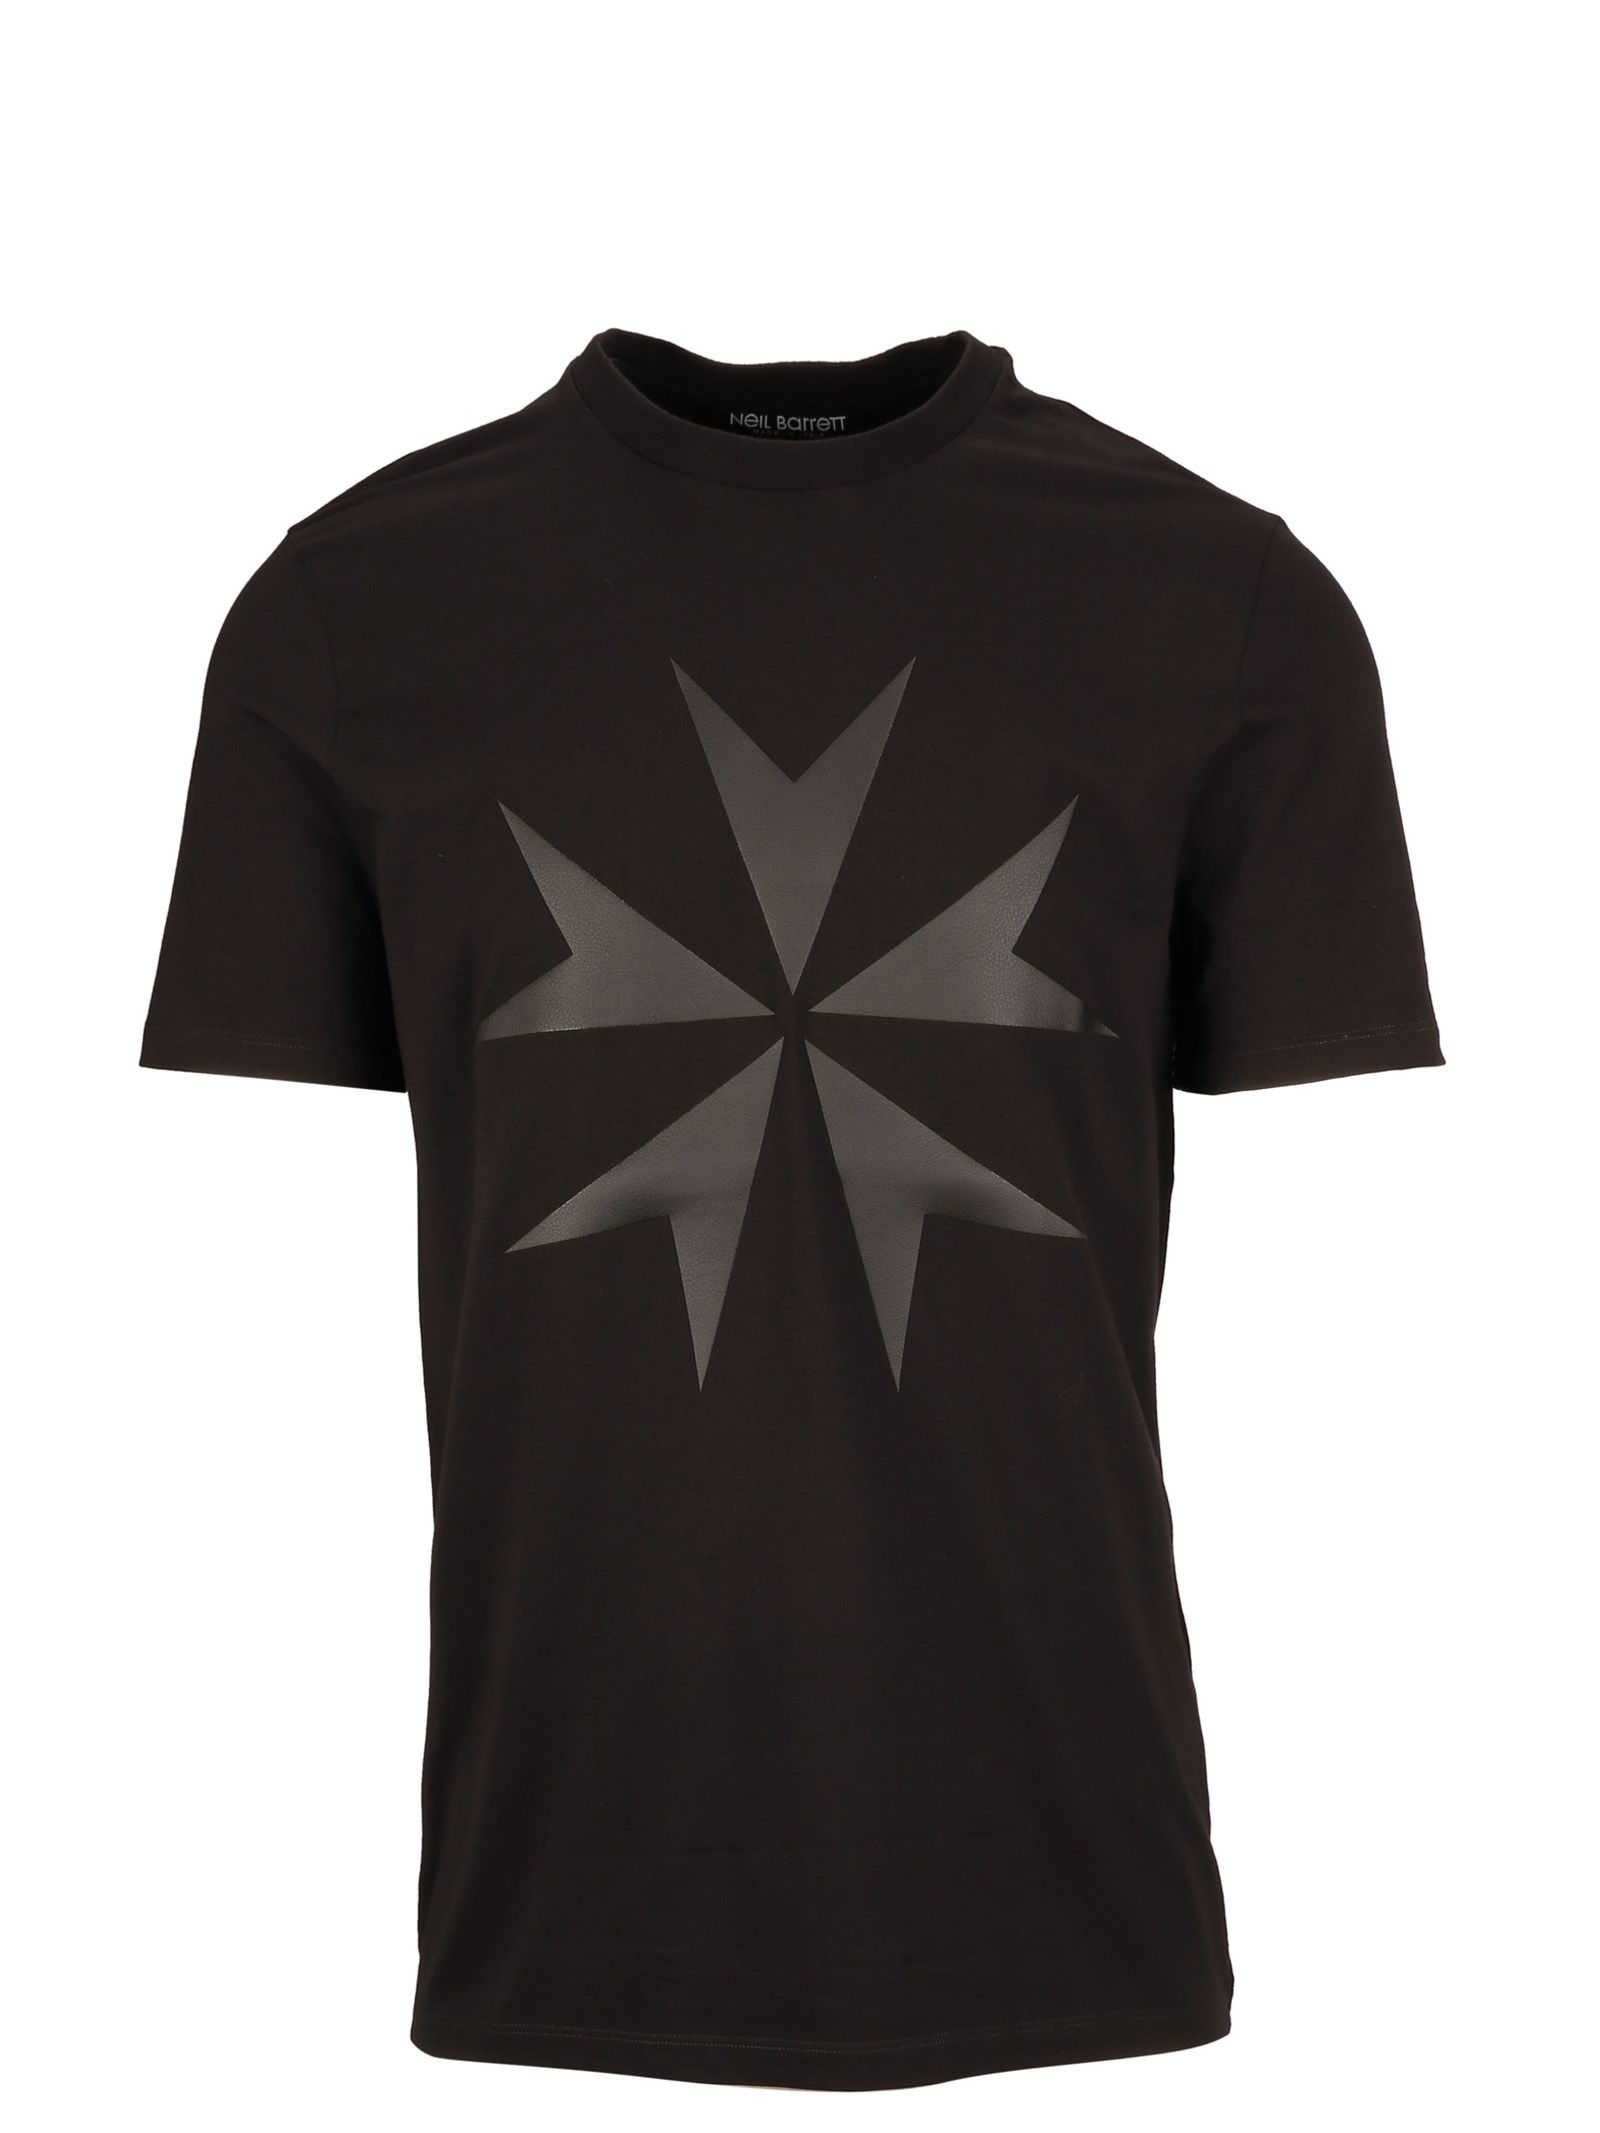 Neil Barrett Military Cross T-shirt